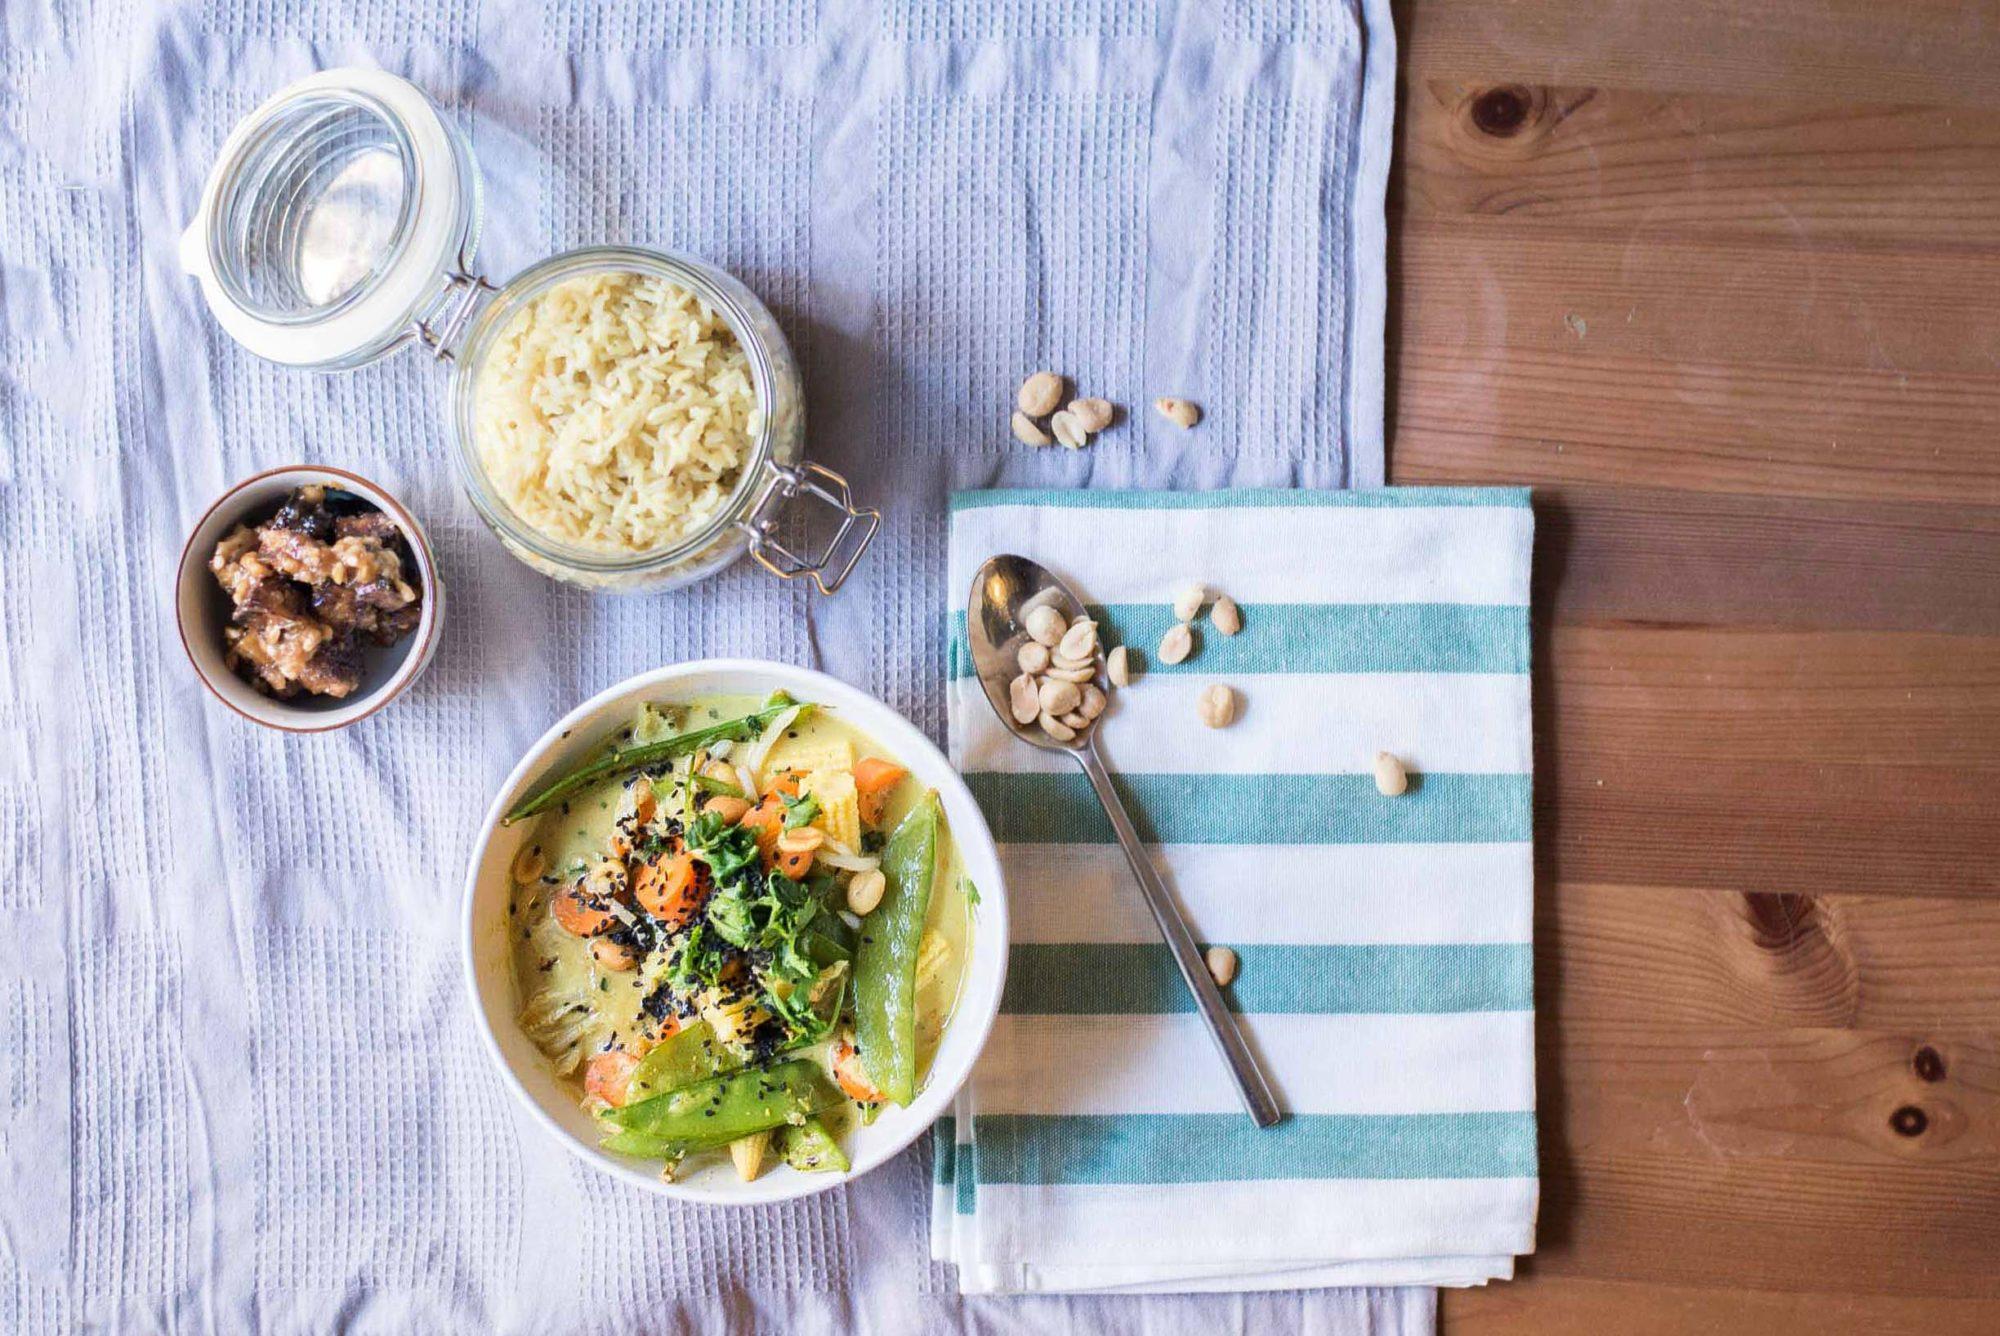 veganes thai-inspiriertes gemüsecurry Reis Tofu Erdnusbutter dogdays of summer blog vintage onlienshop graz Kokos